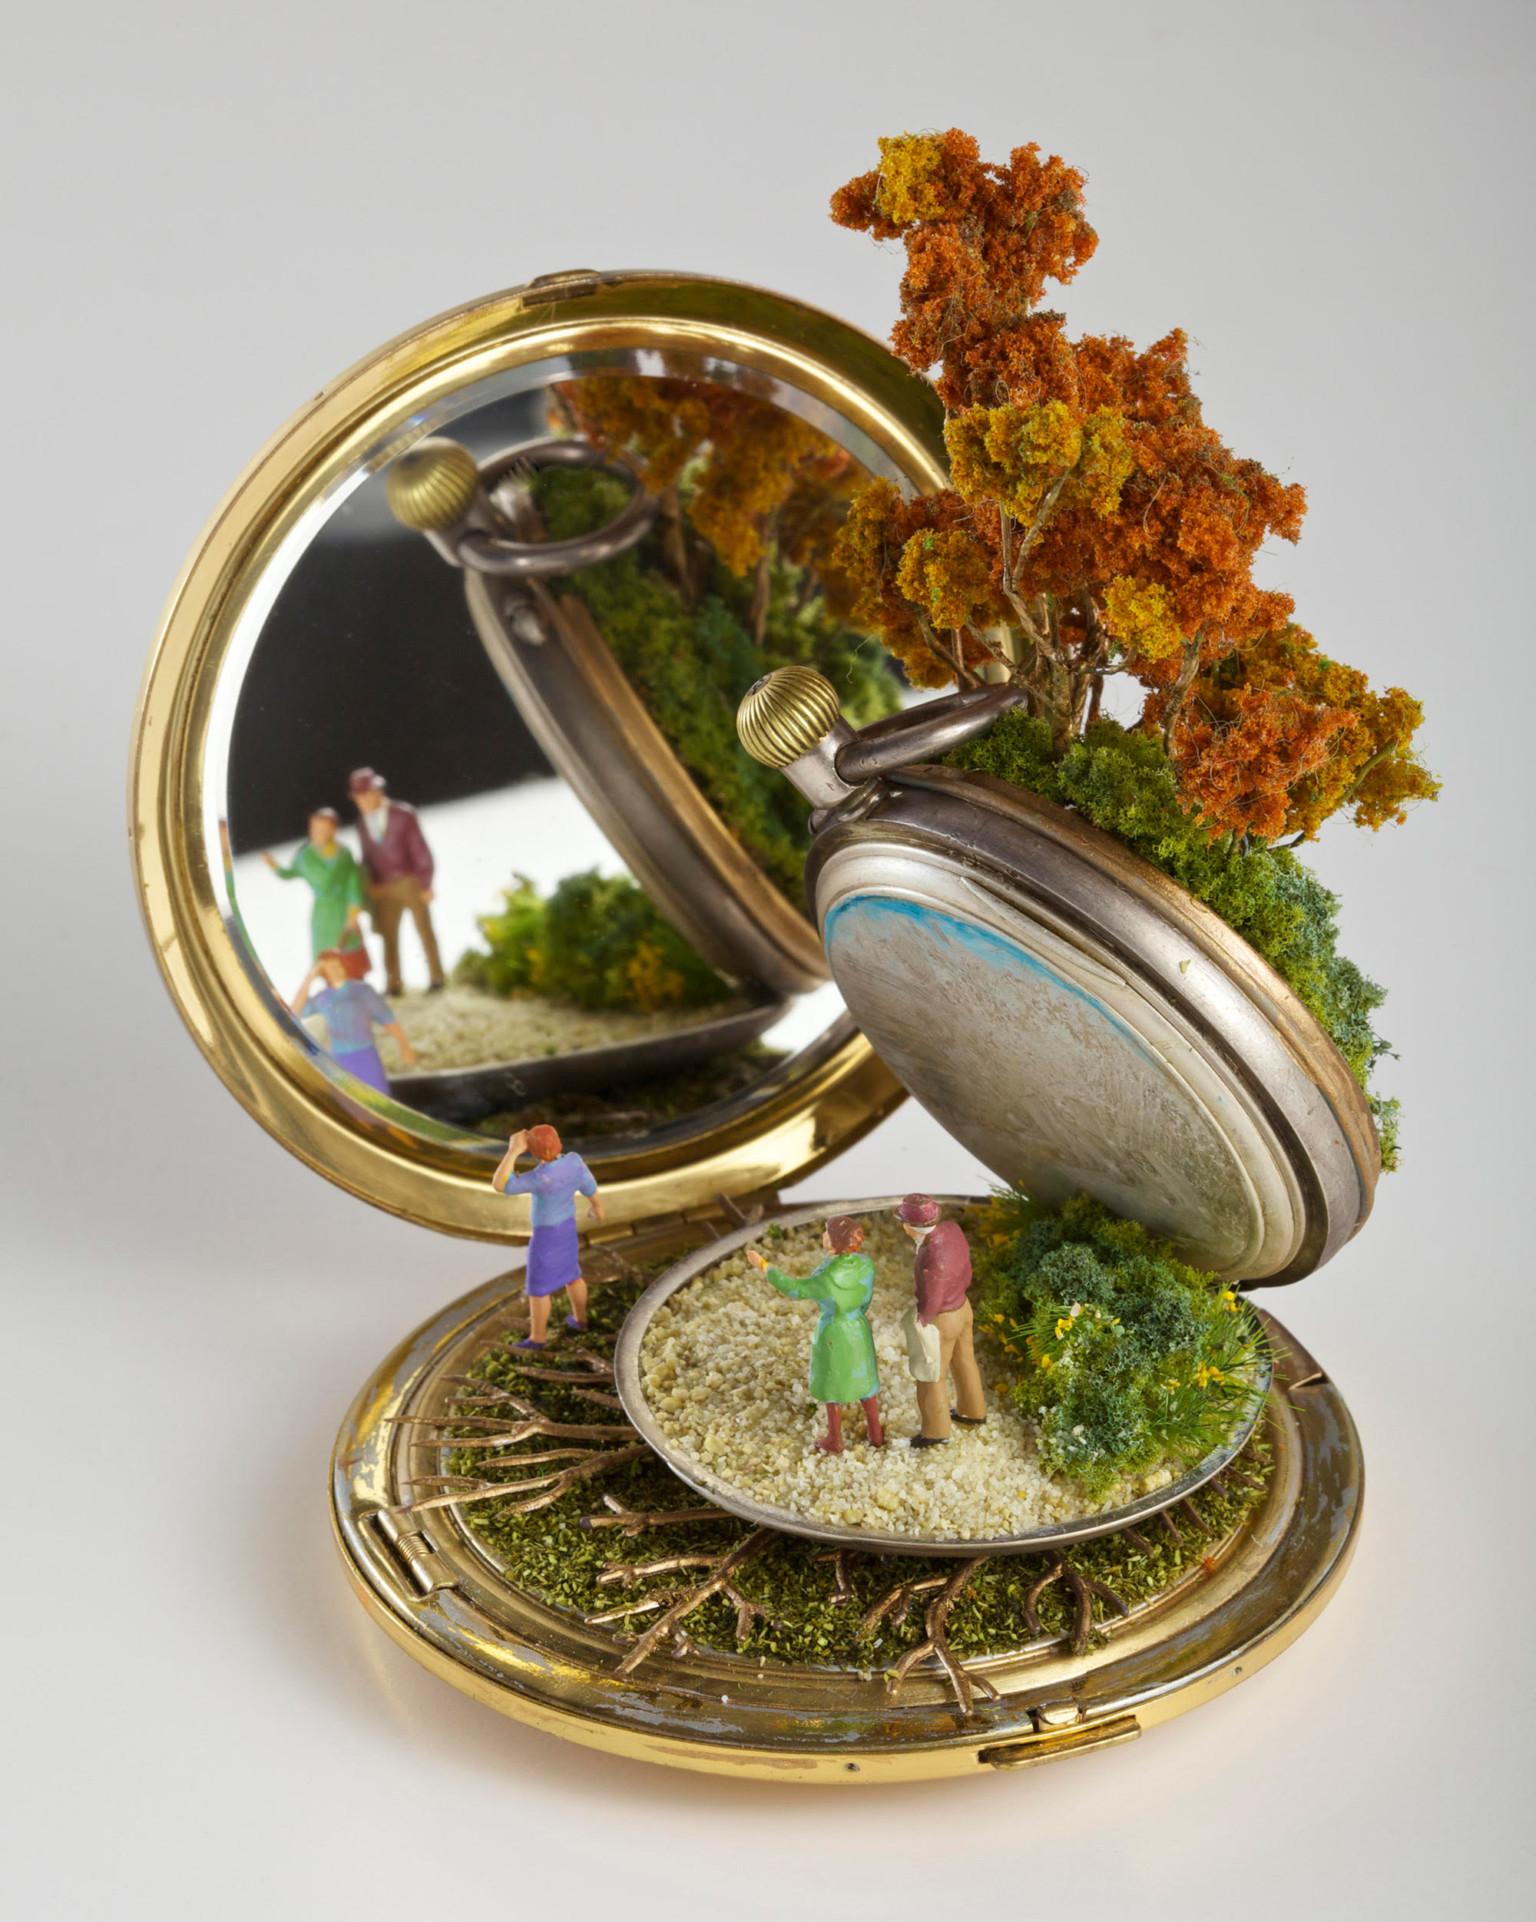 kendal-murray-miniatur-szobrai-noko-03.jpg